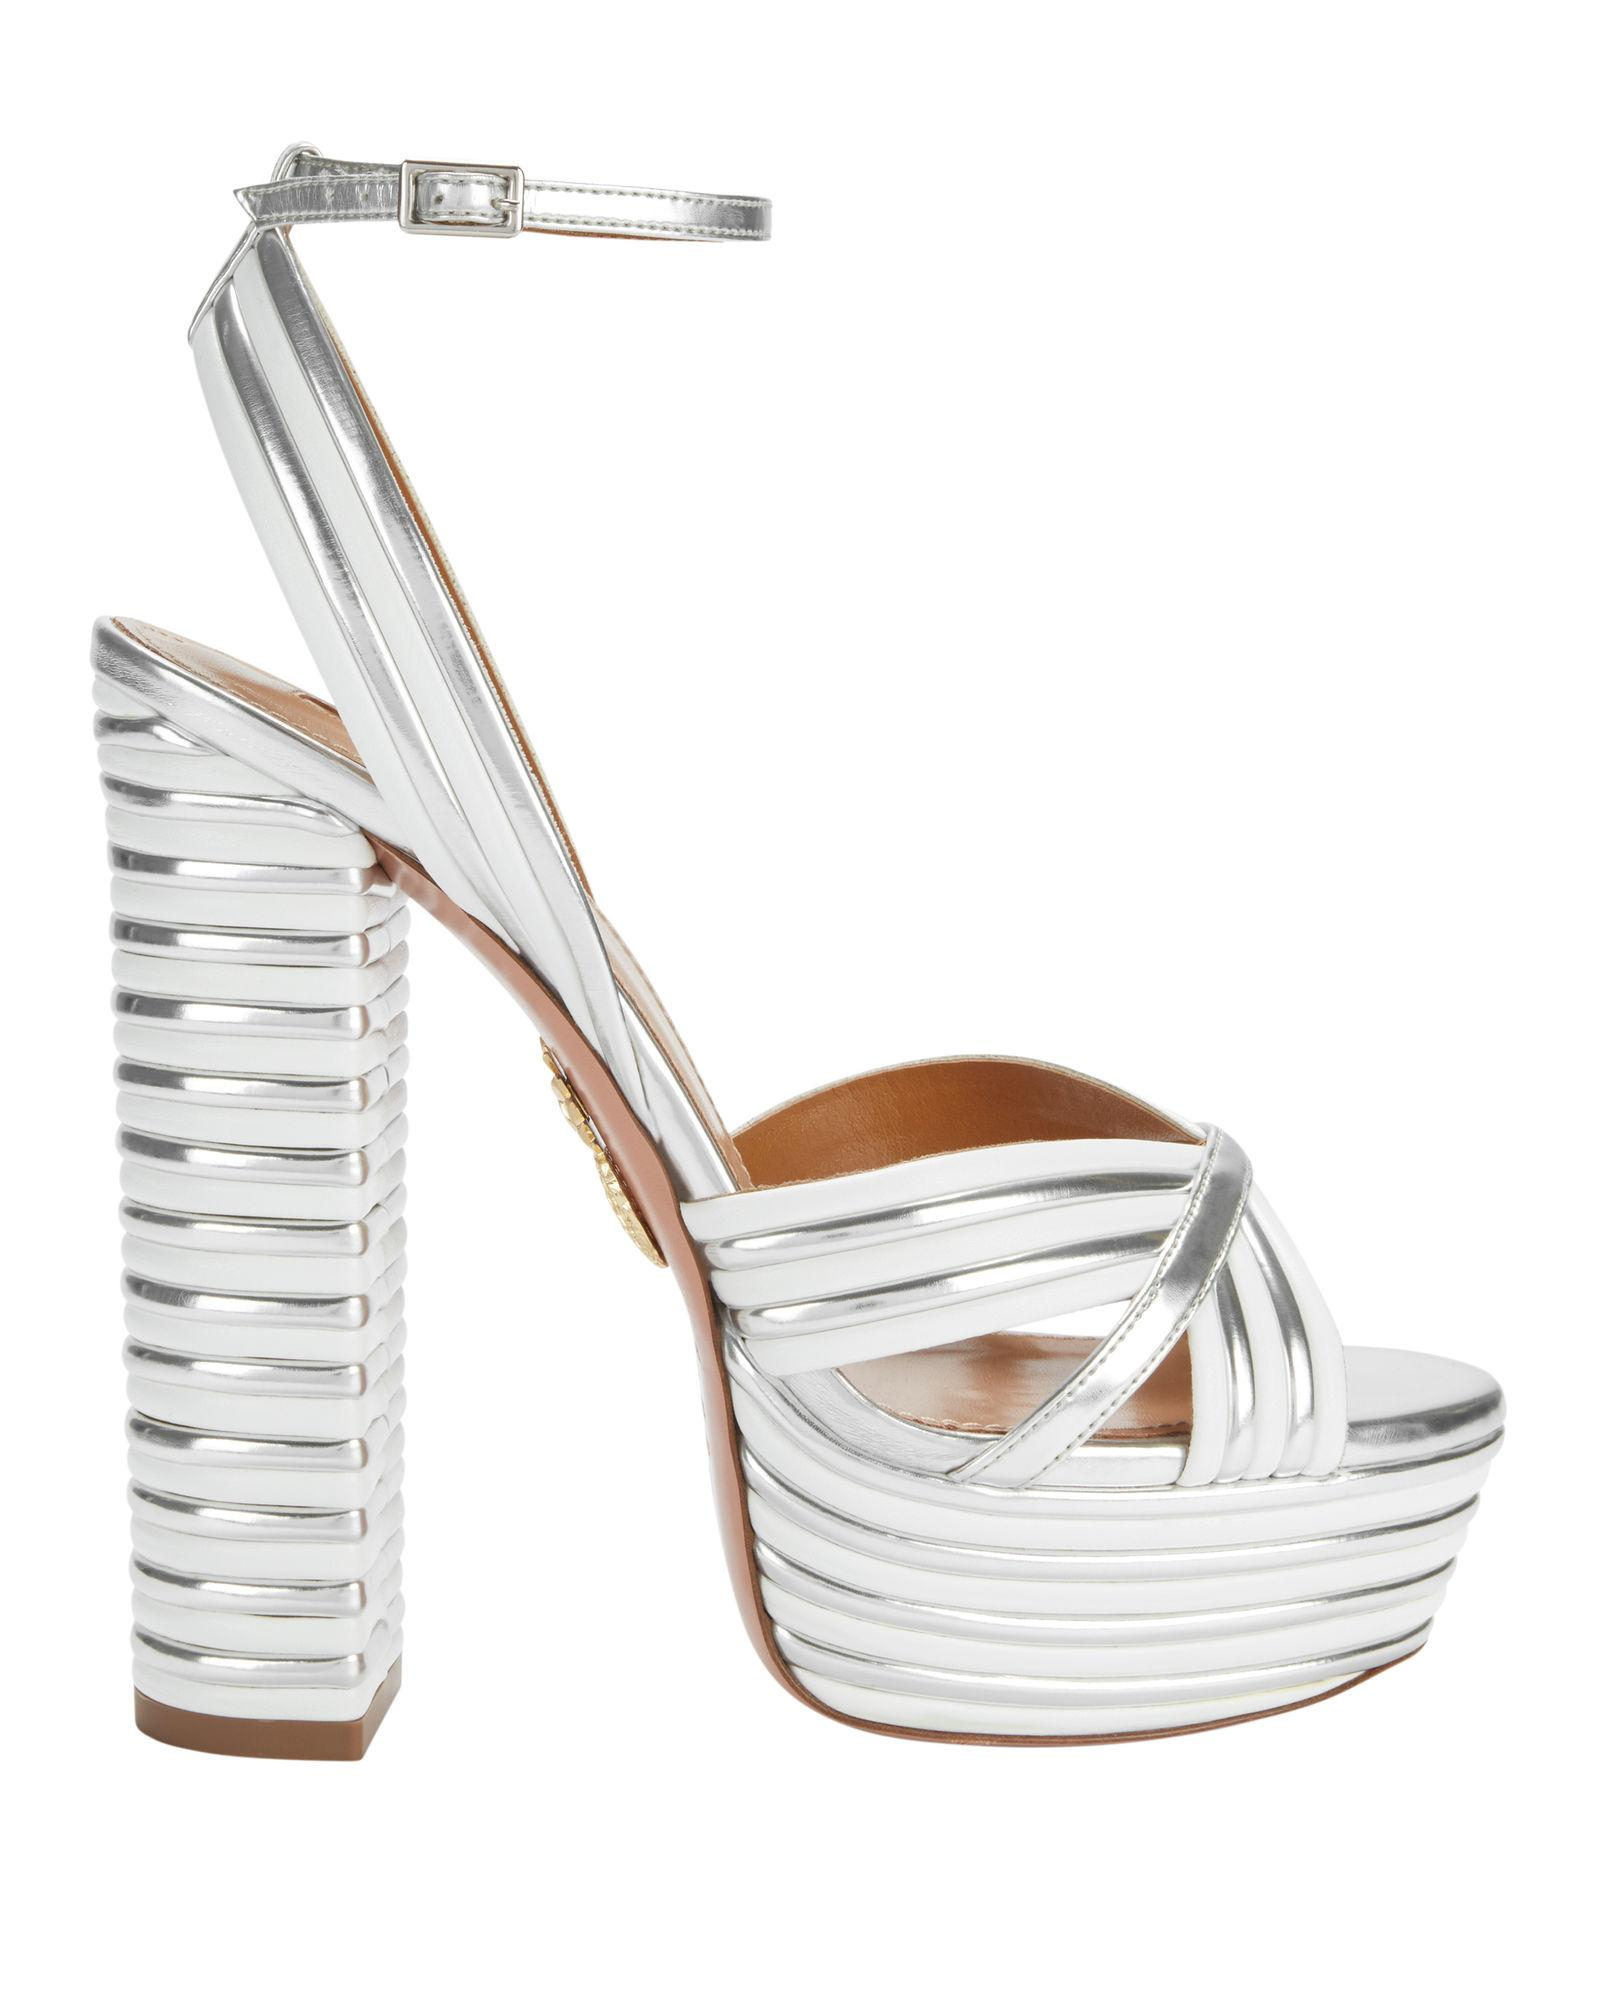 37e1ab56905 Aquazzura Sundance 150 Metallic Faux Leather Platform Sandals In Silver